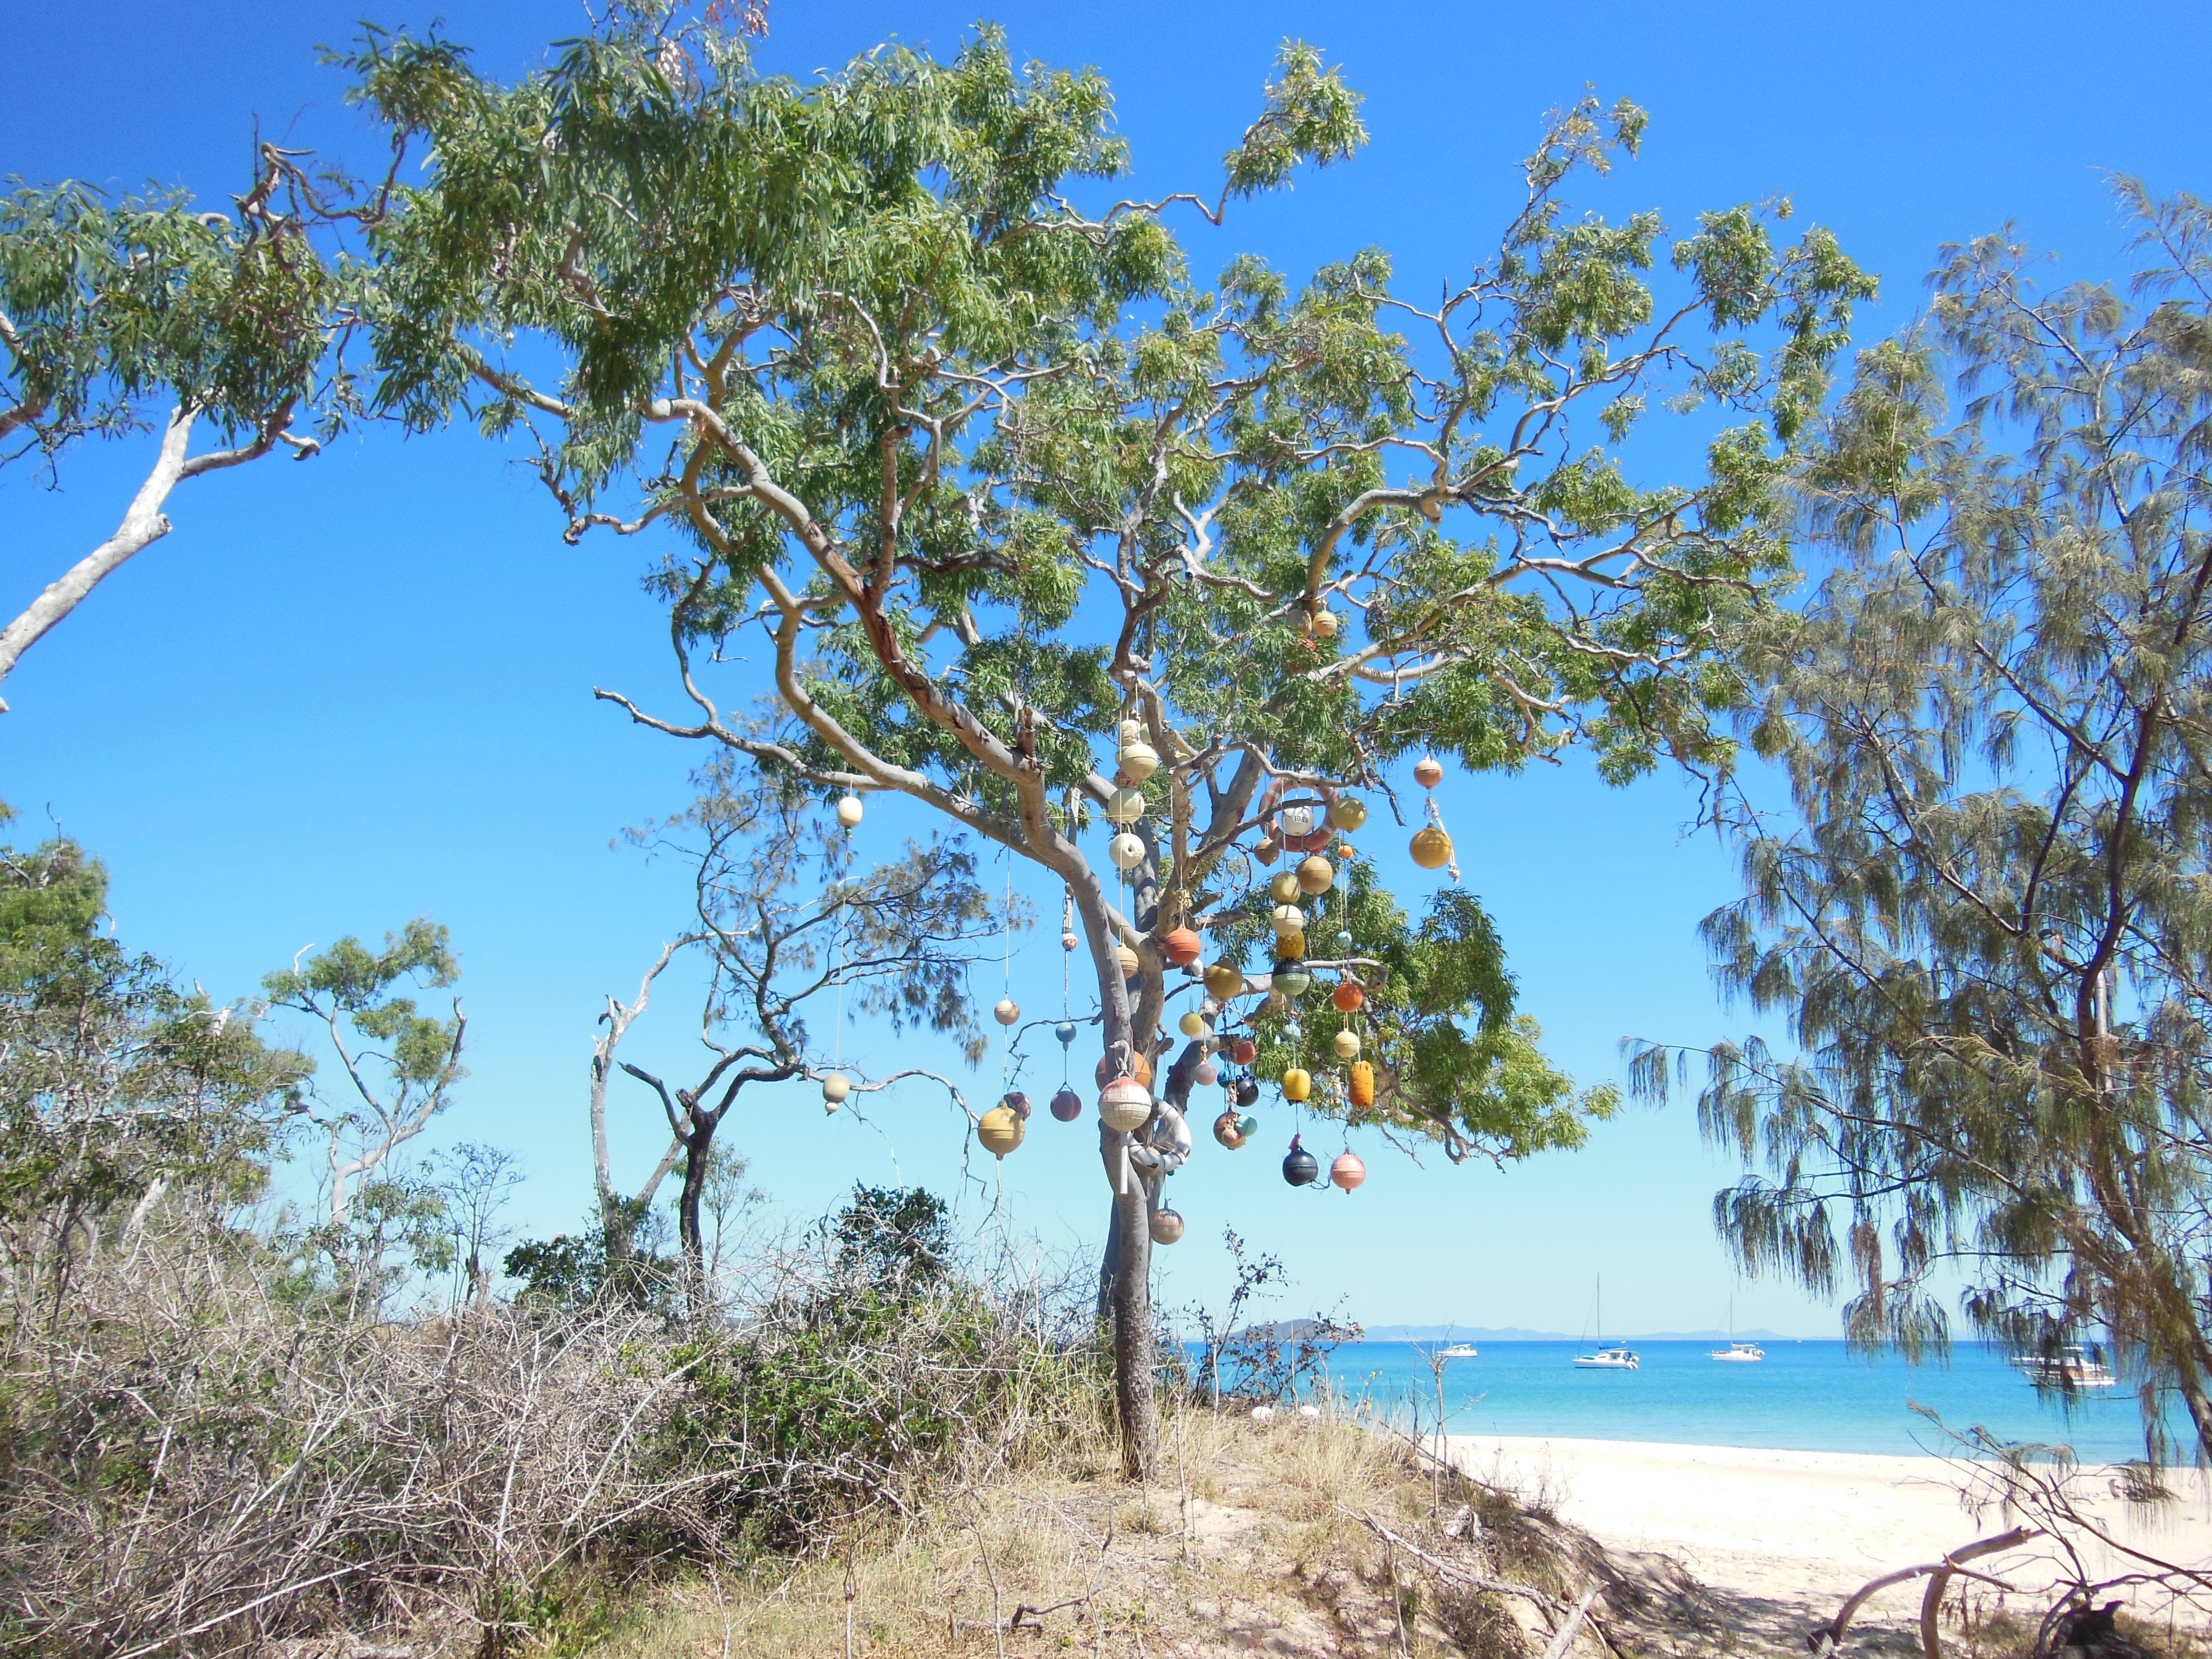 paradise island apk download